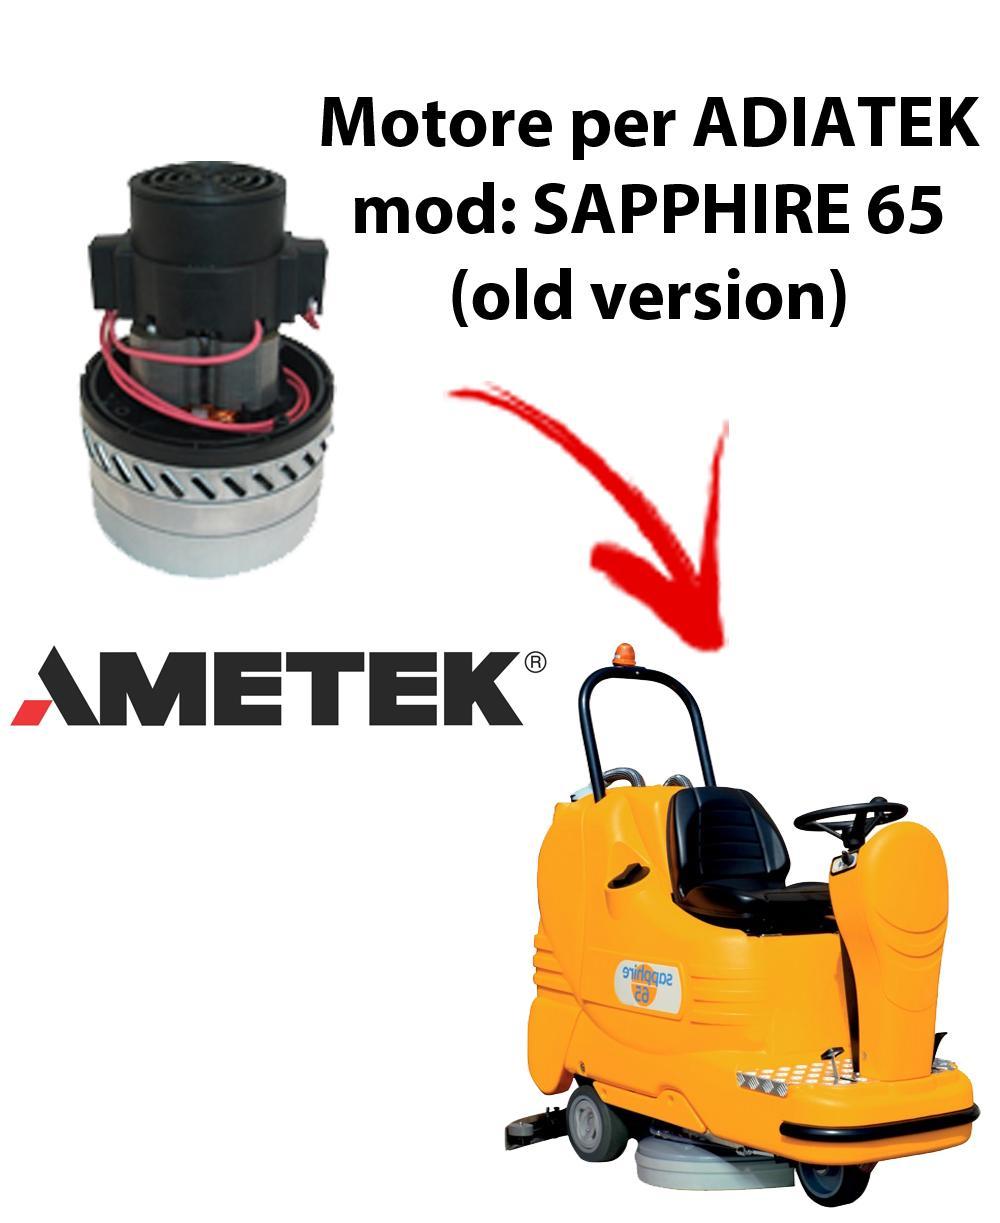 Sapphire 65 (old version) Motore aspirazione AMETEK ITALIA lavapavimenti Adiatek